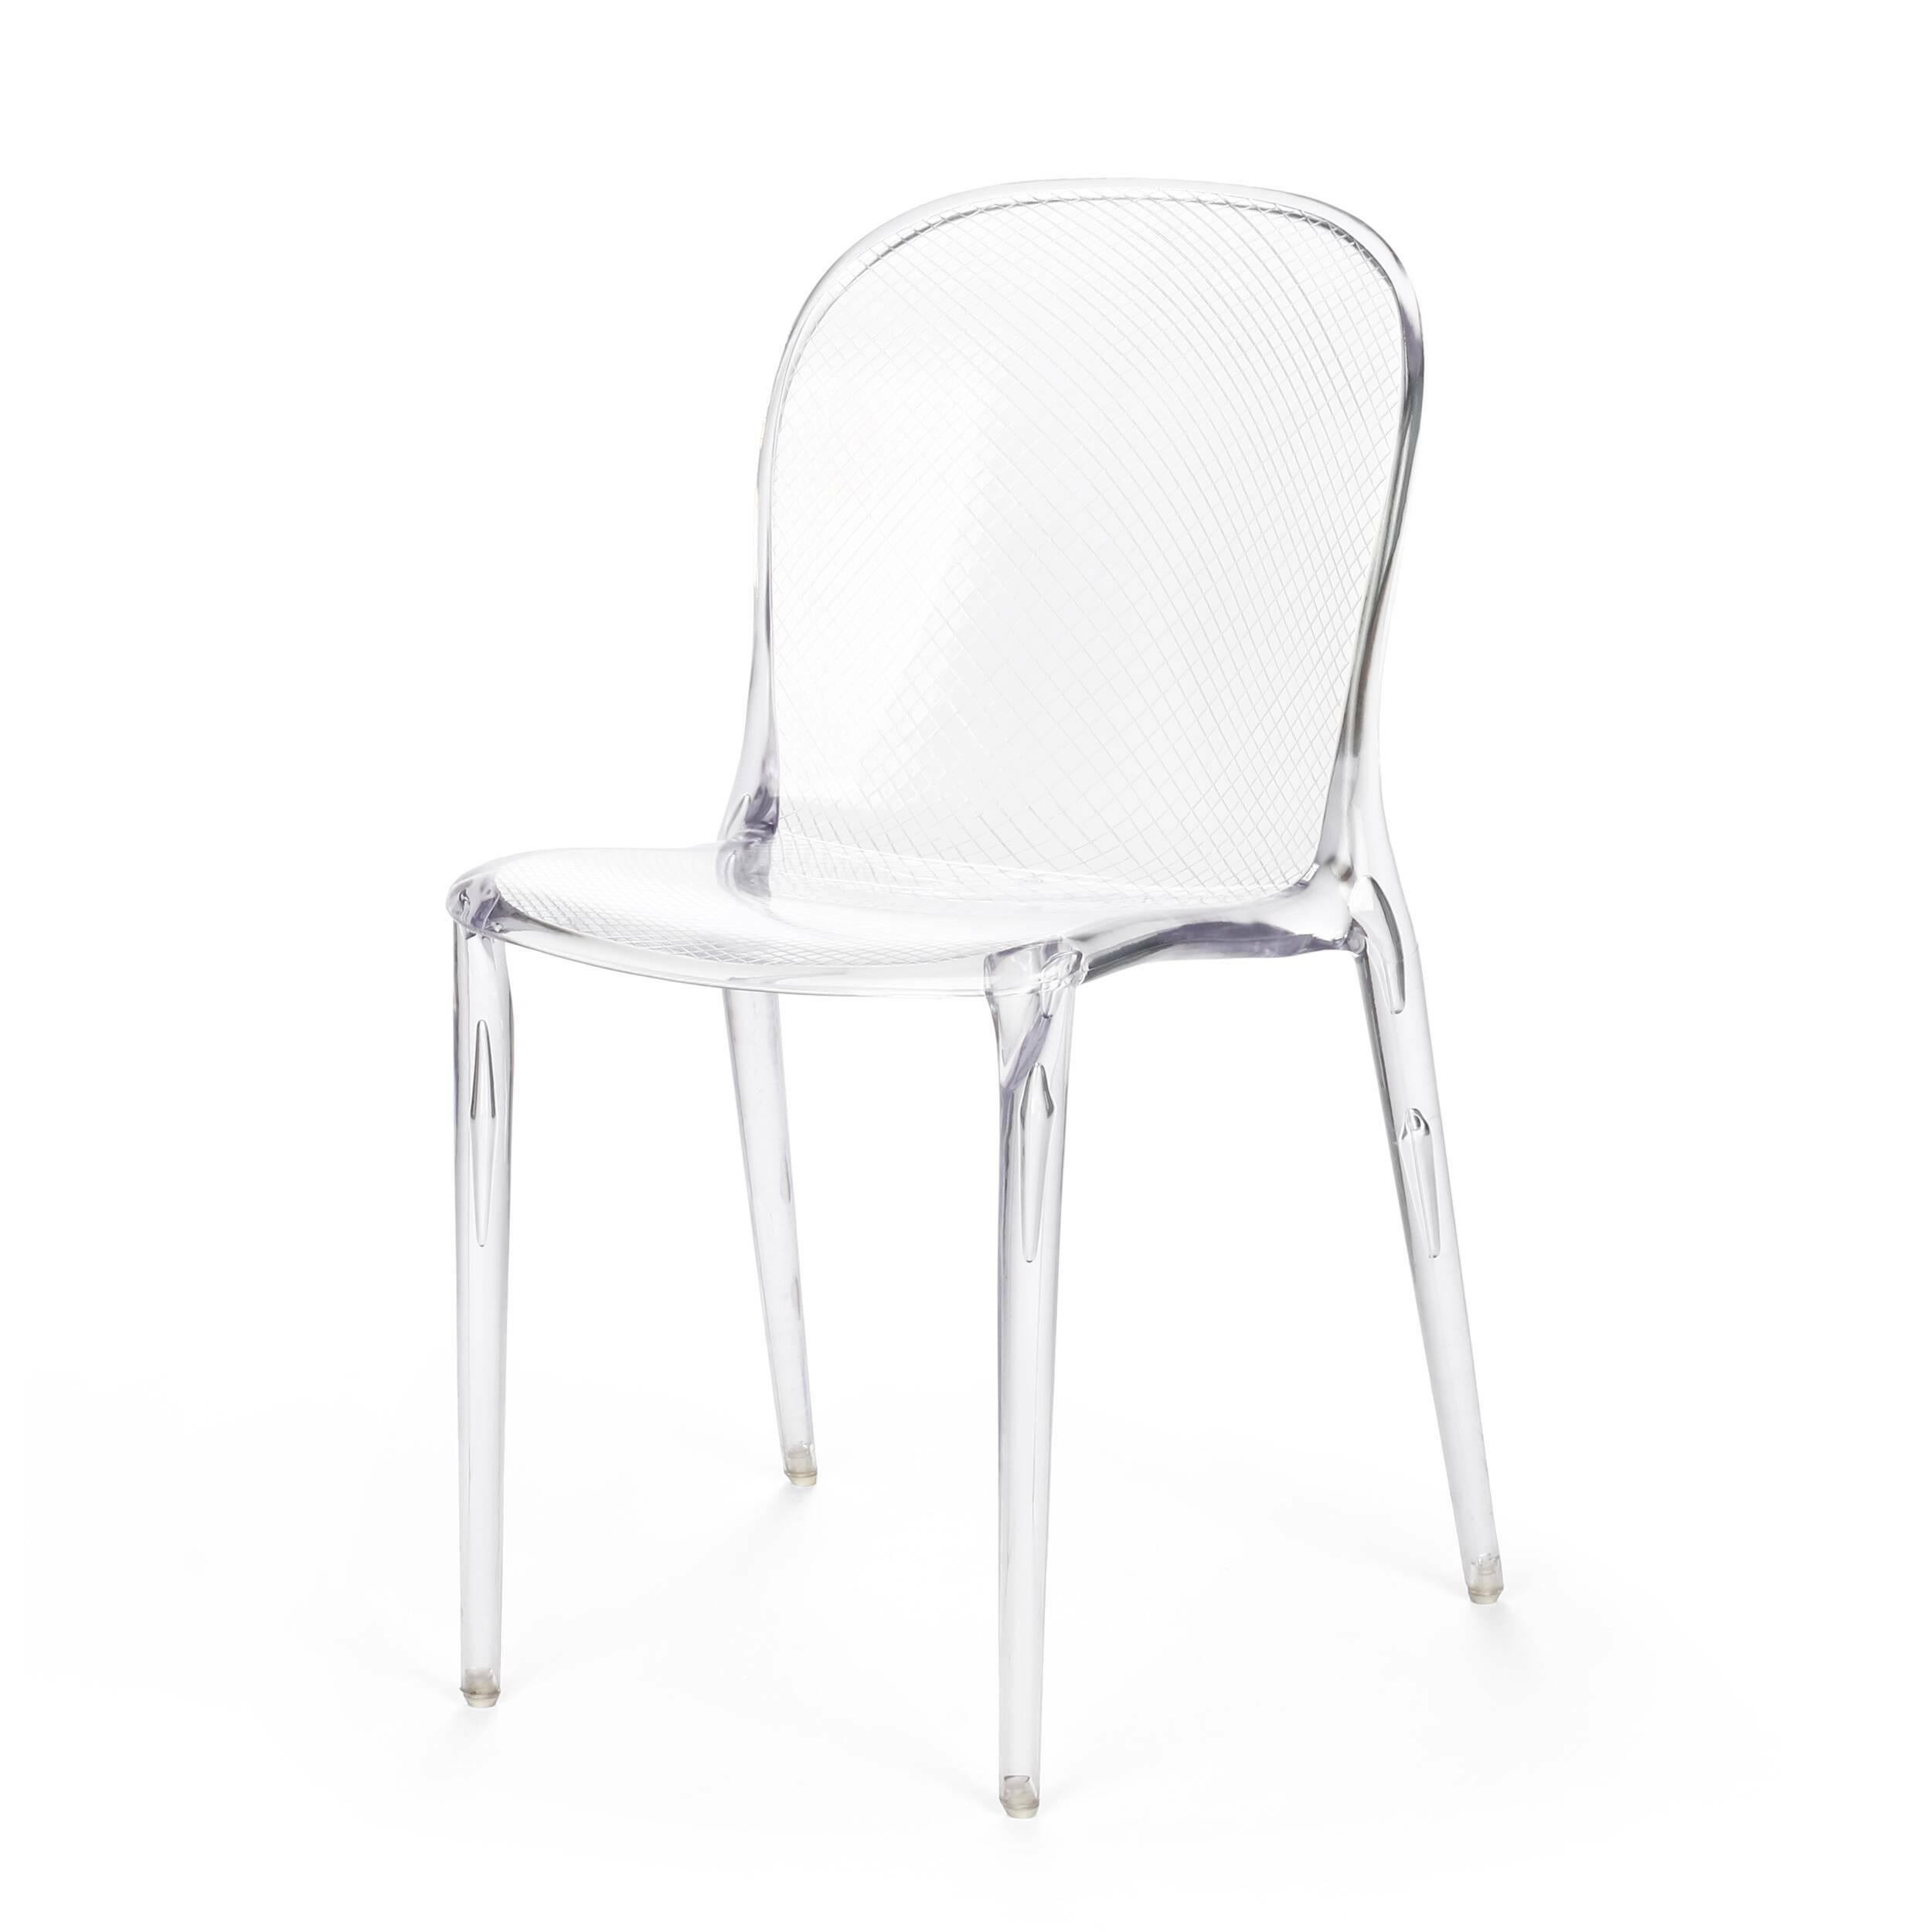 Стул Violet стул пмдк октябренок ромашки violet light 00000045543